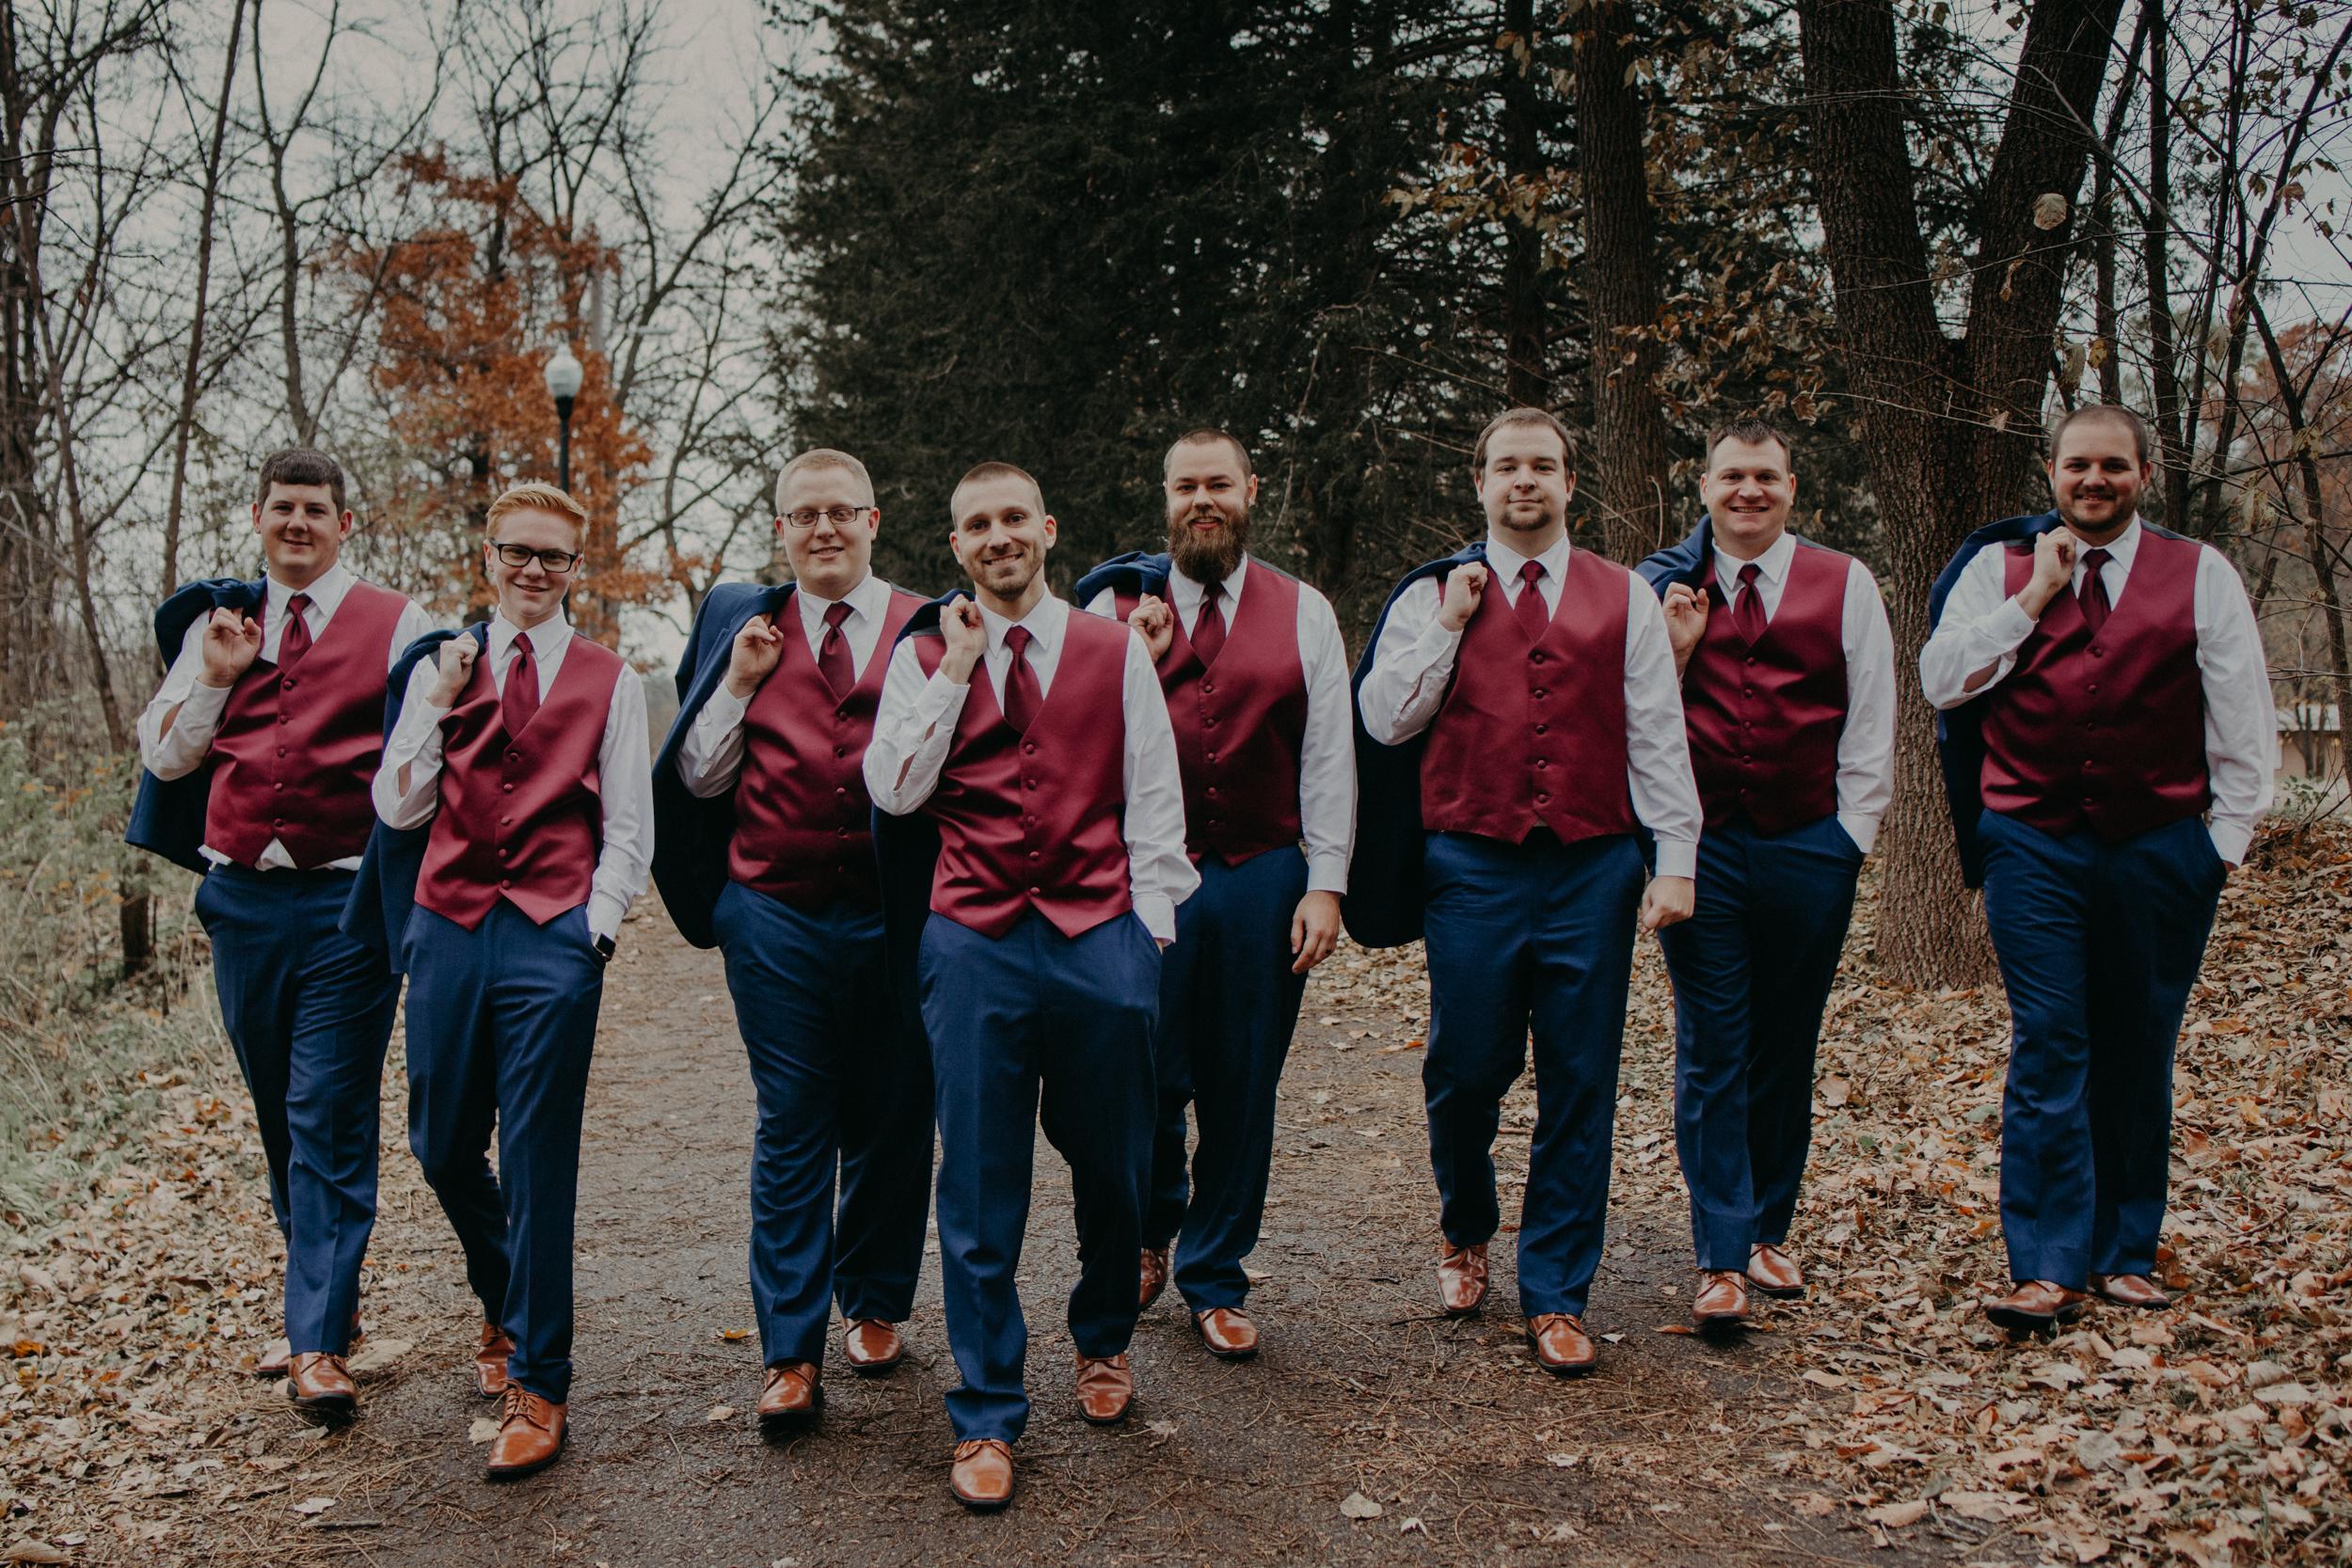 Weisenbeck_Wedding_Oct2018-383.jpg